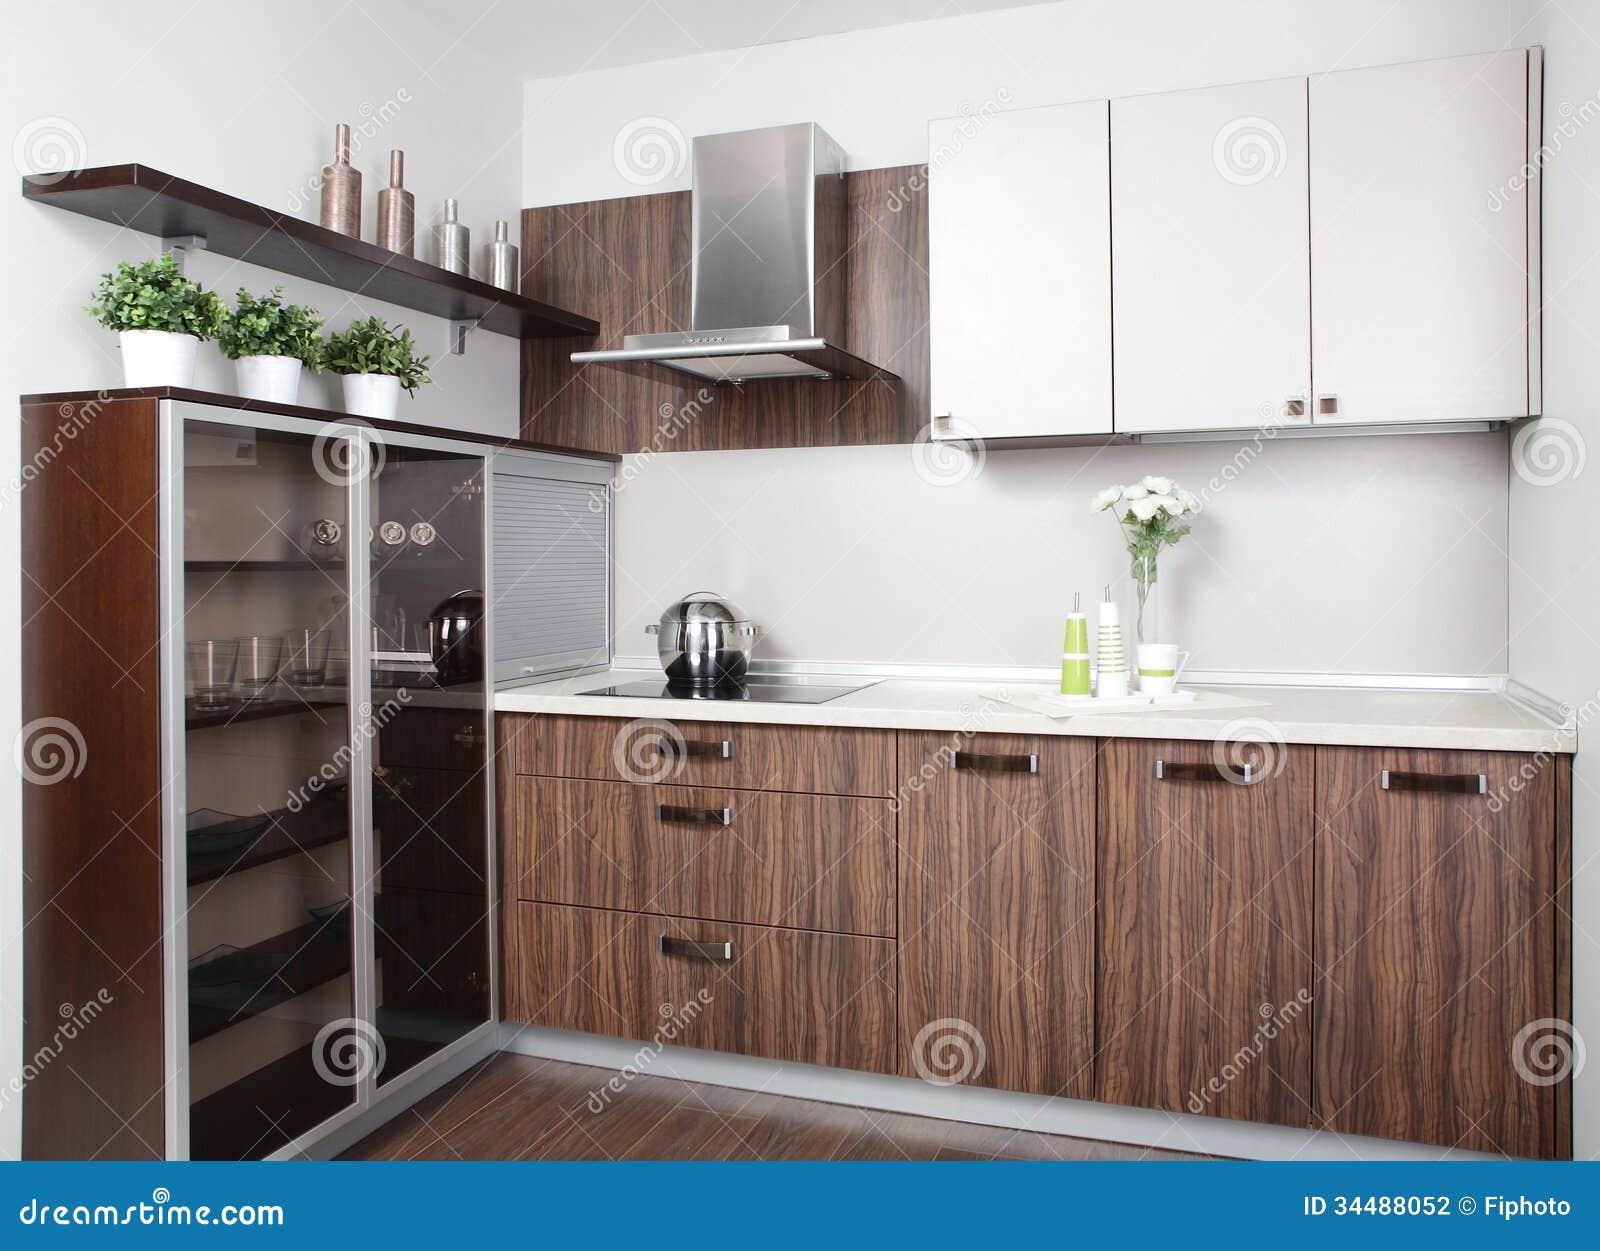 Kitchen luxury kitchen cabinets cleaning cleaning kitchen for Best cleaner for wooden kitchen cabinets